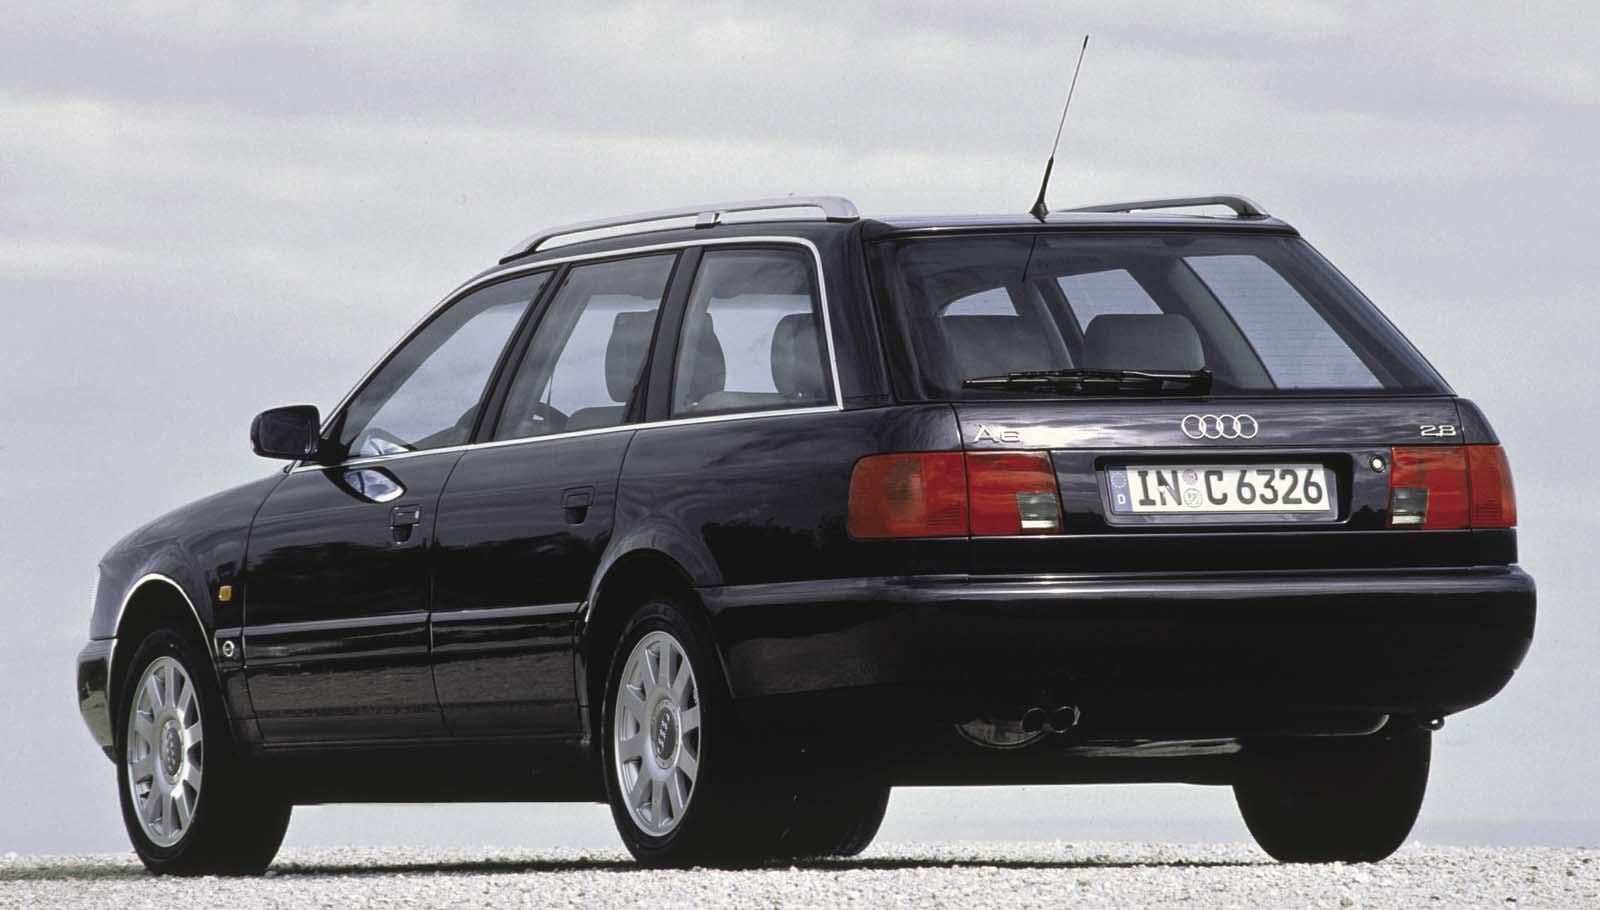 Descargar 1024x1024 Coches Vehículos Automóviles: Foto Audi A6 1994 Audi Coches-historicos